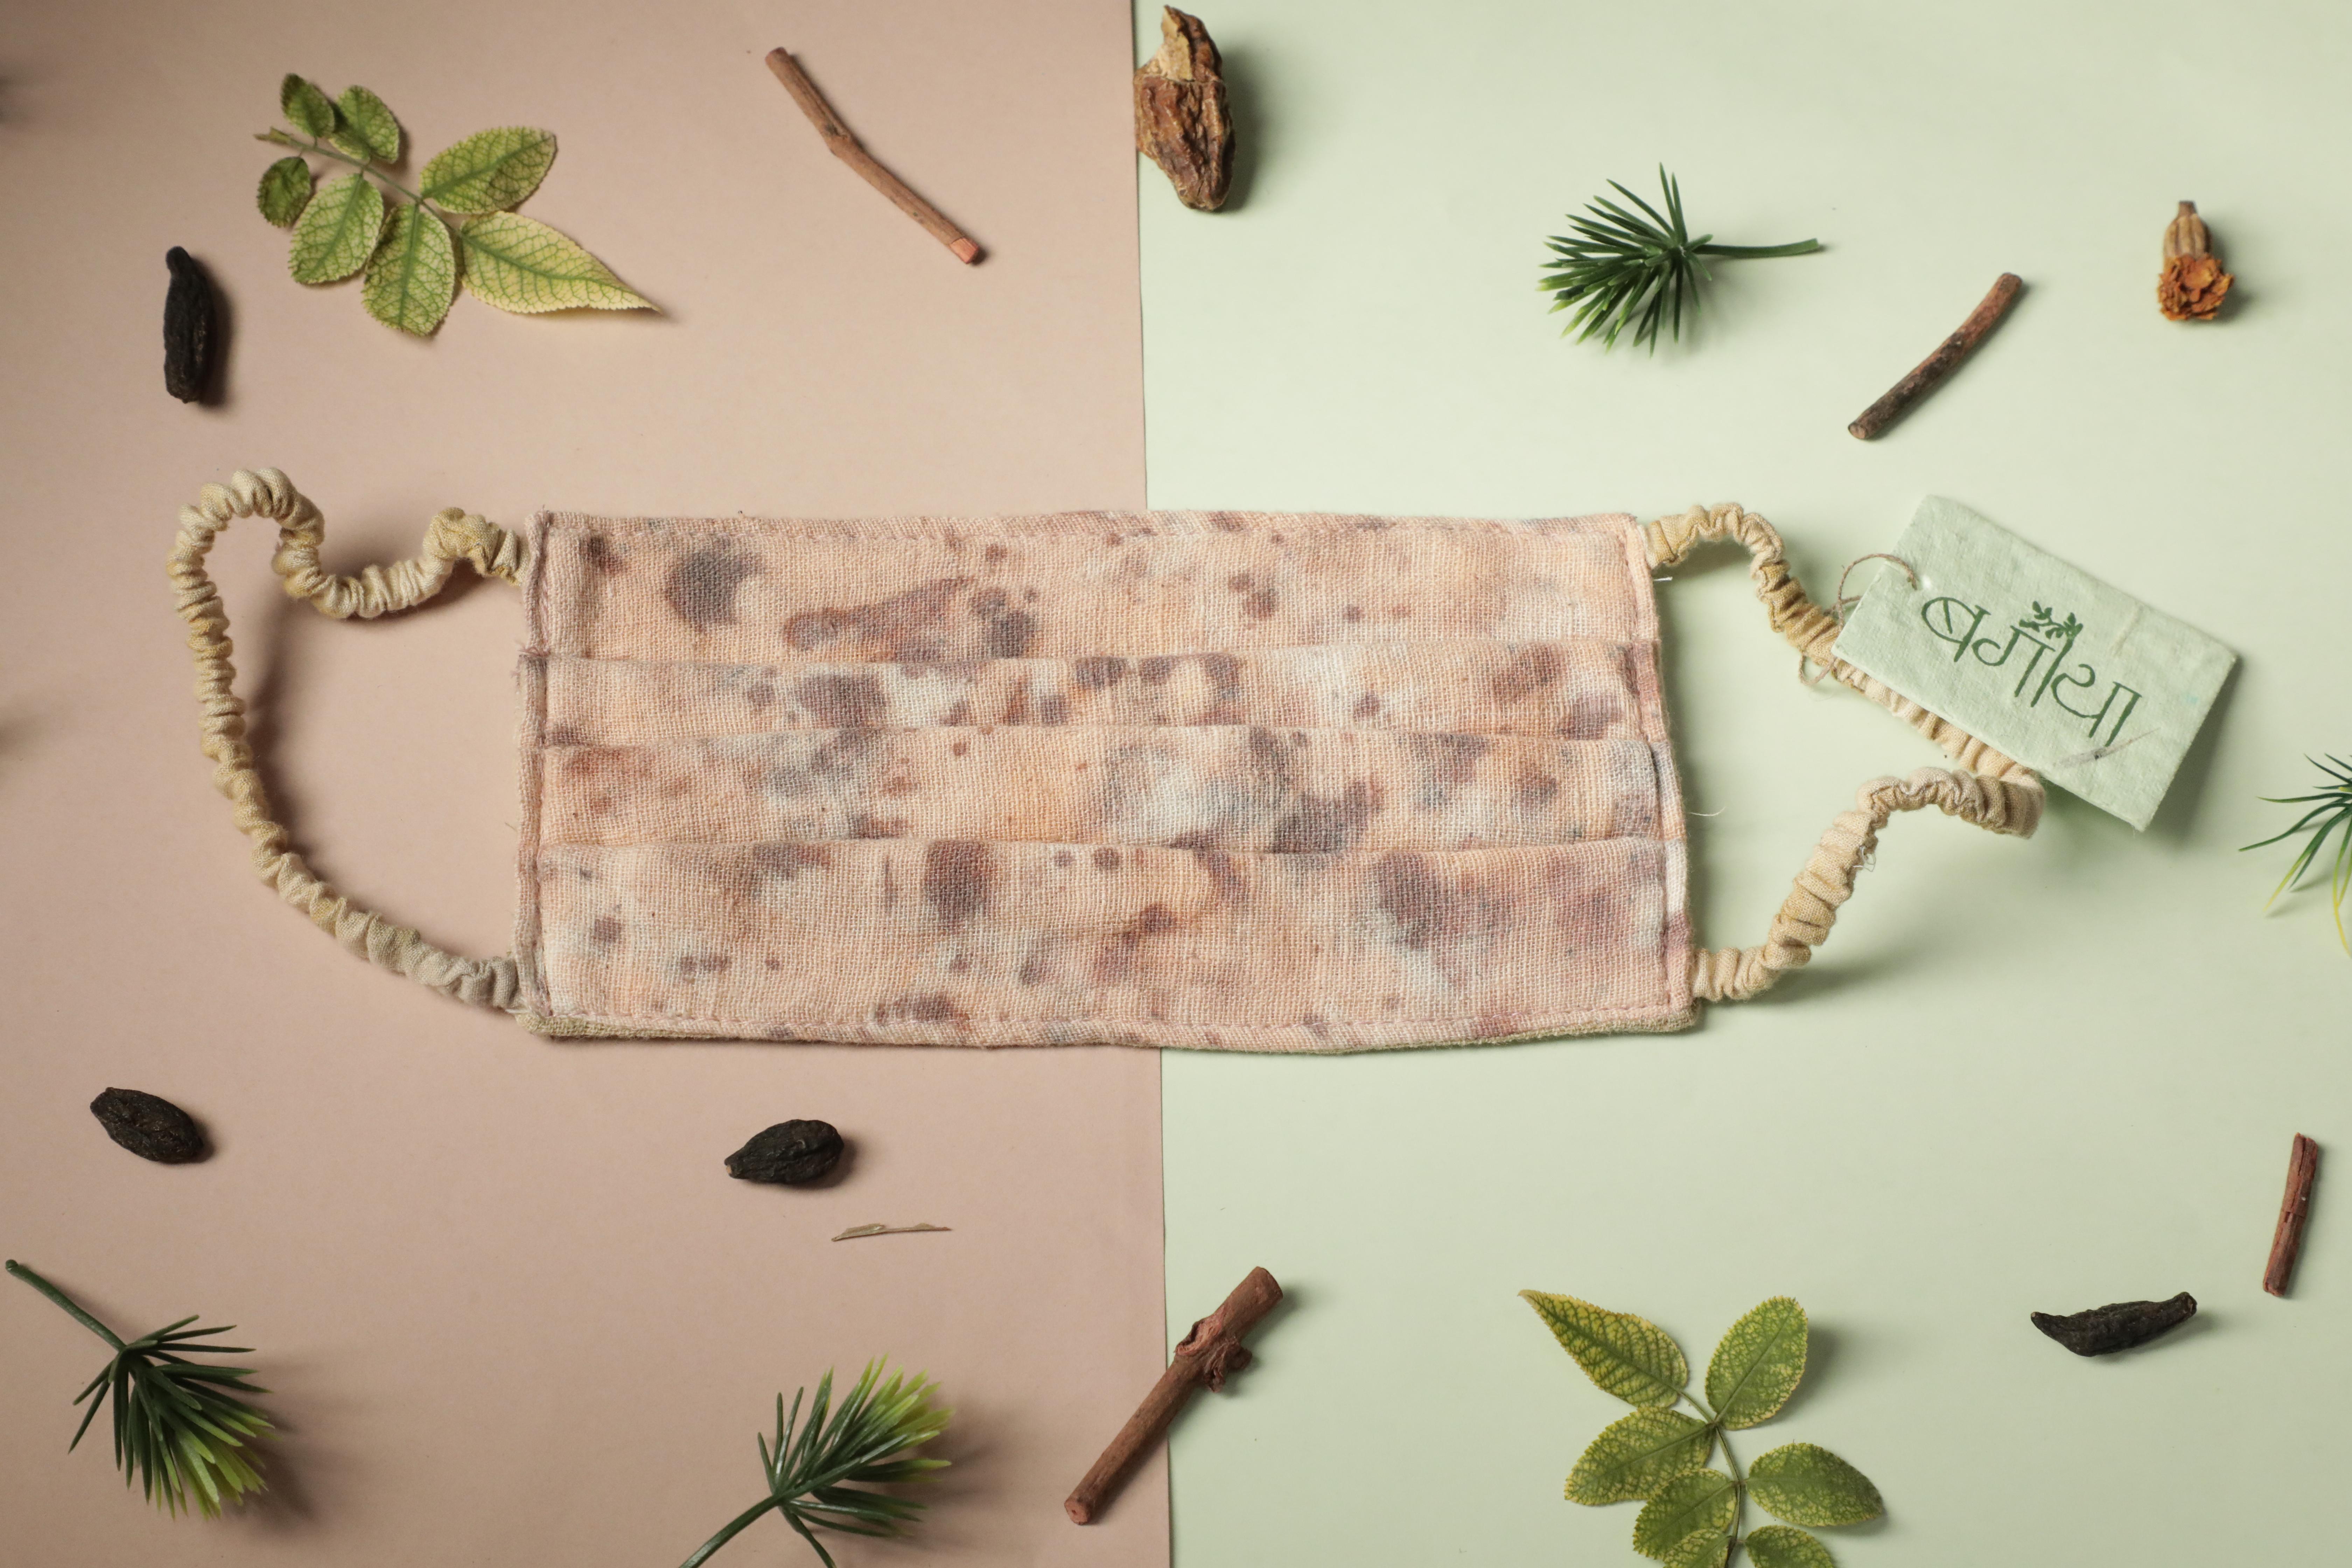 Ayur Herb Upcycled Kala Cotton Face-masks